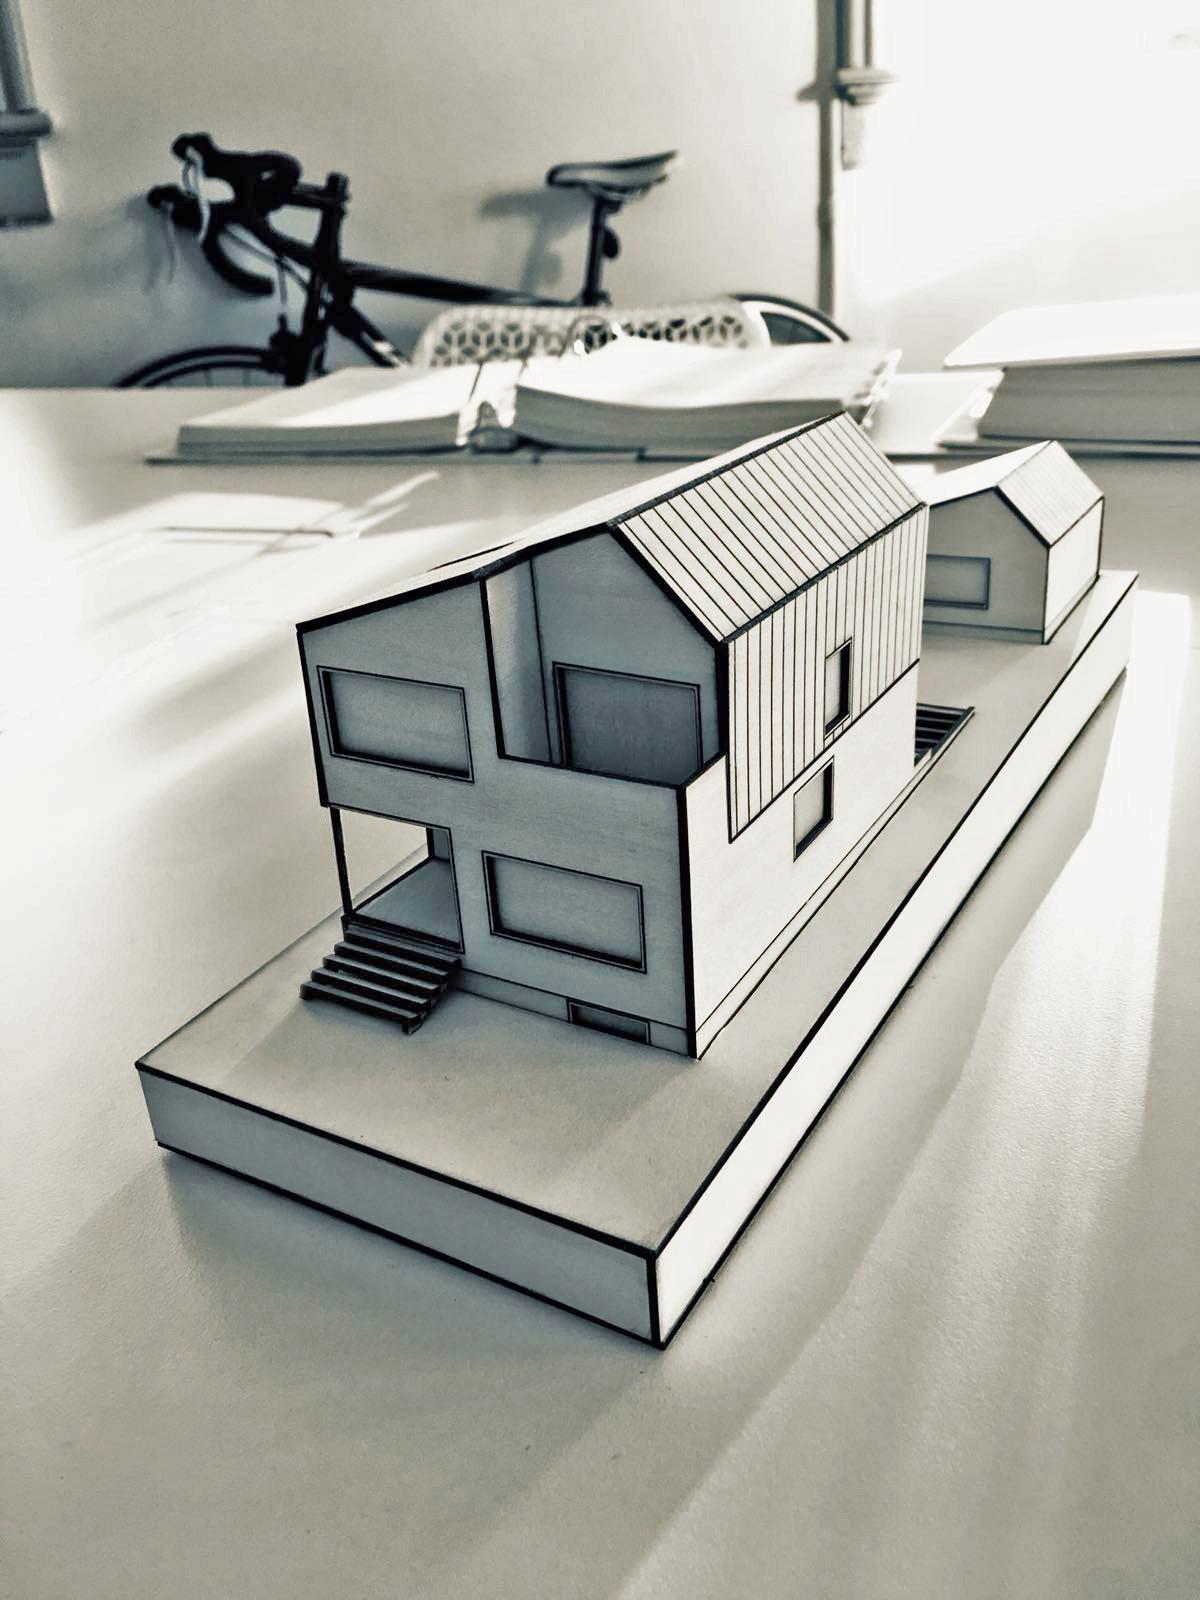 180316 Subtract House Model.jpg